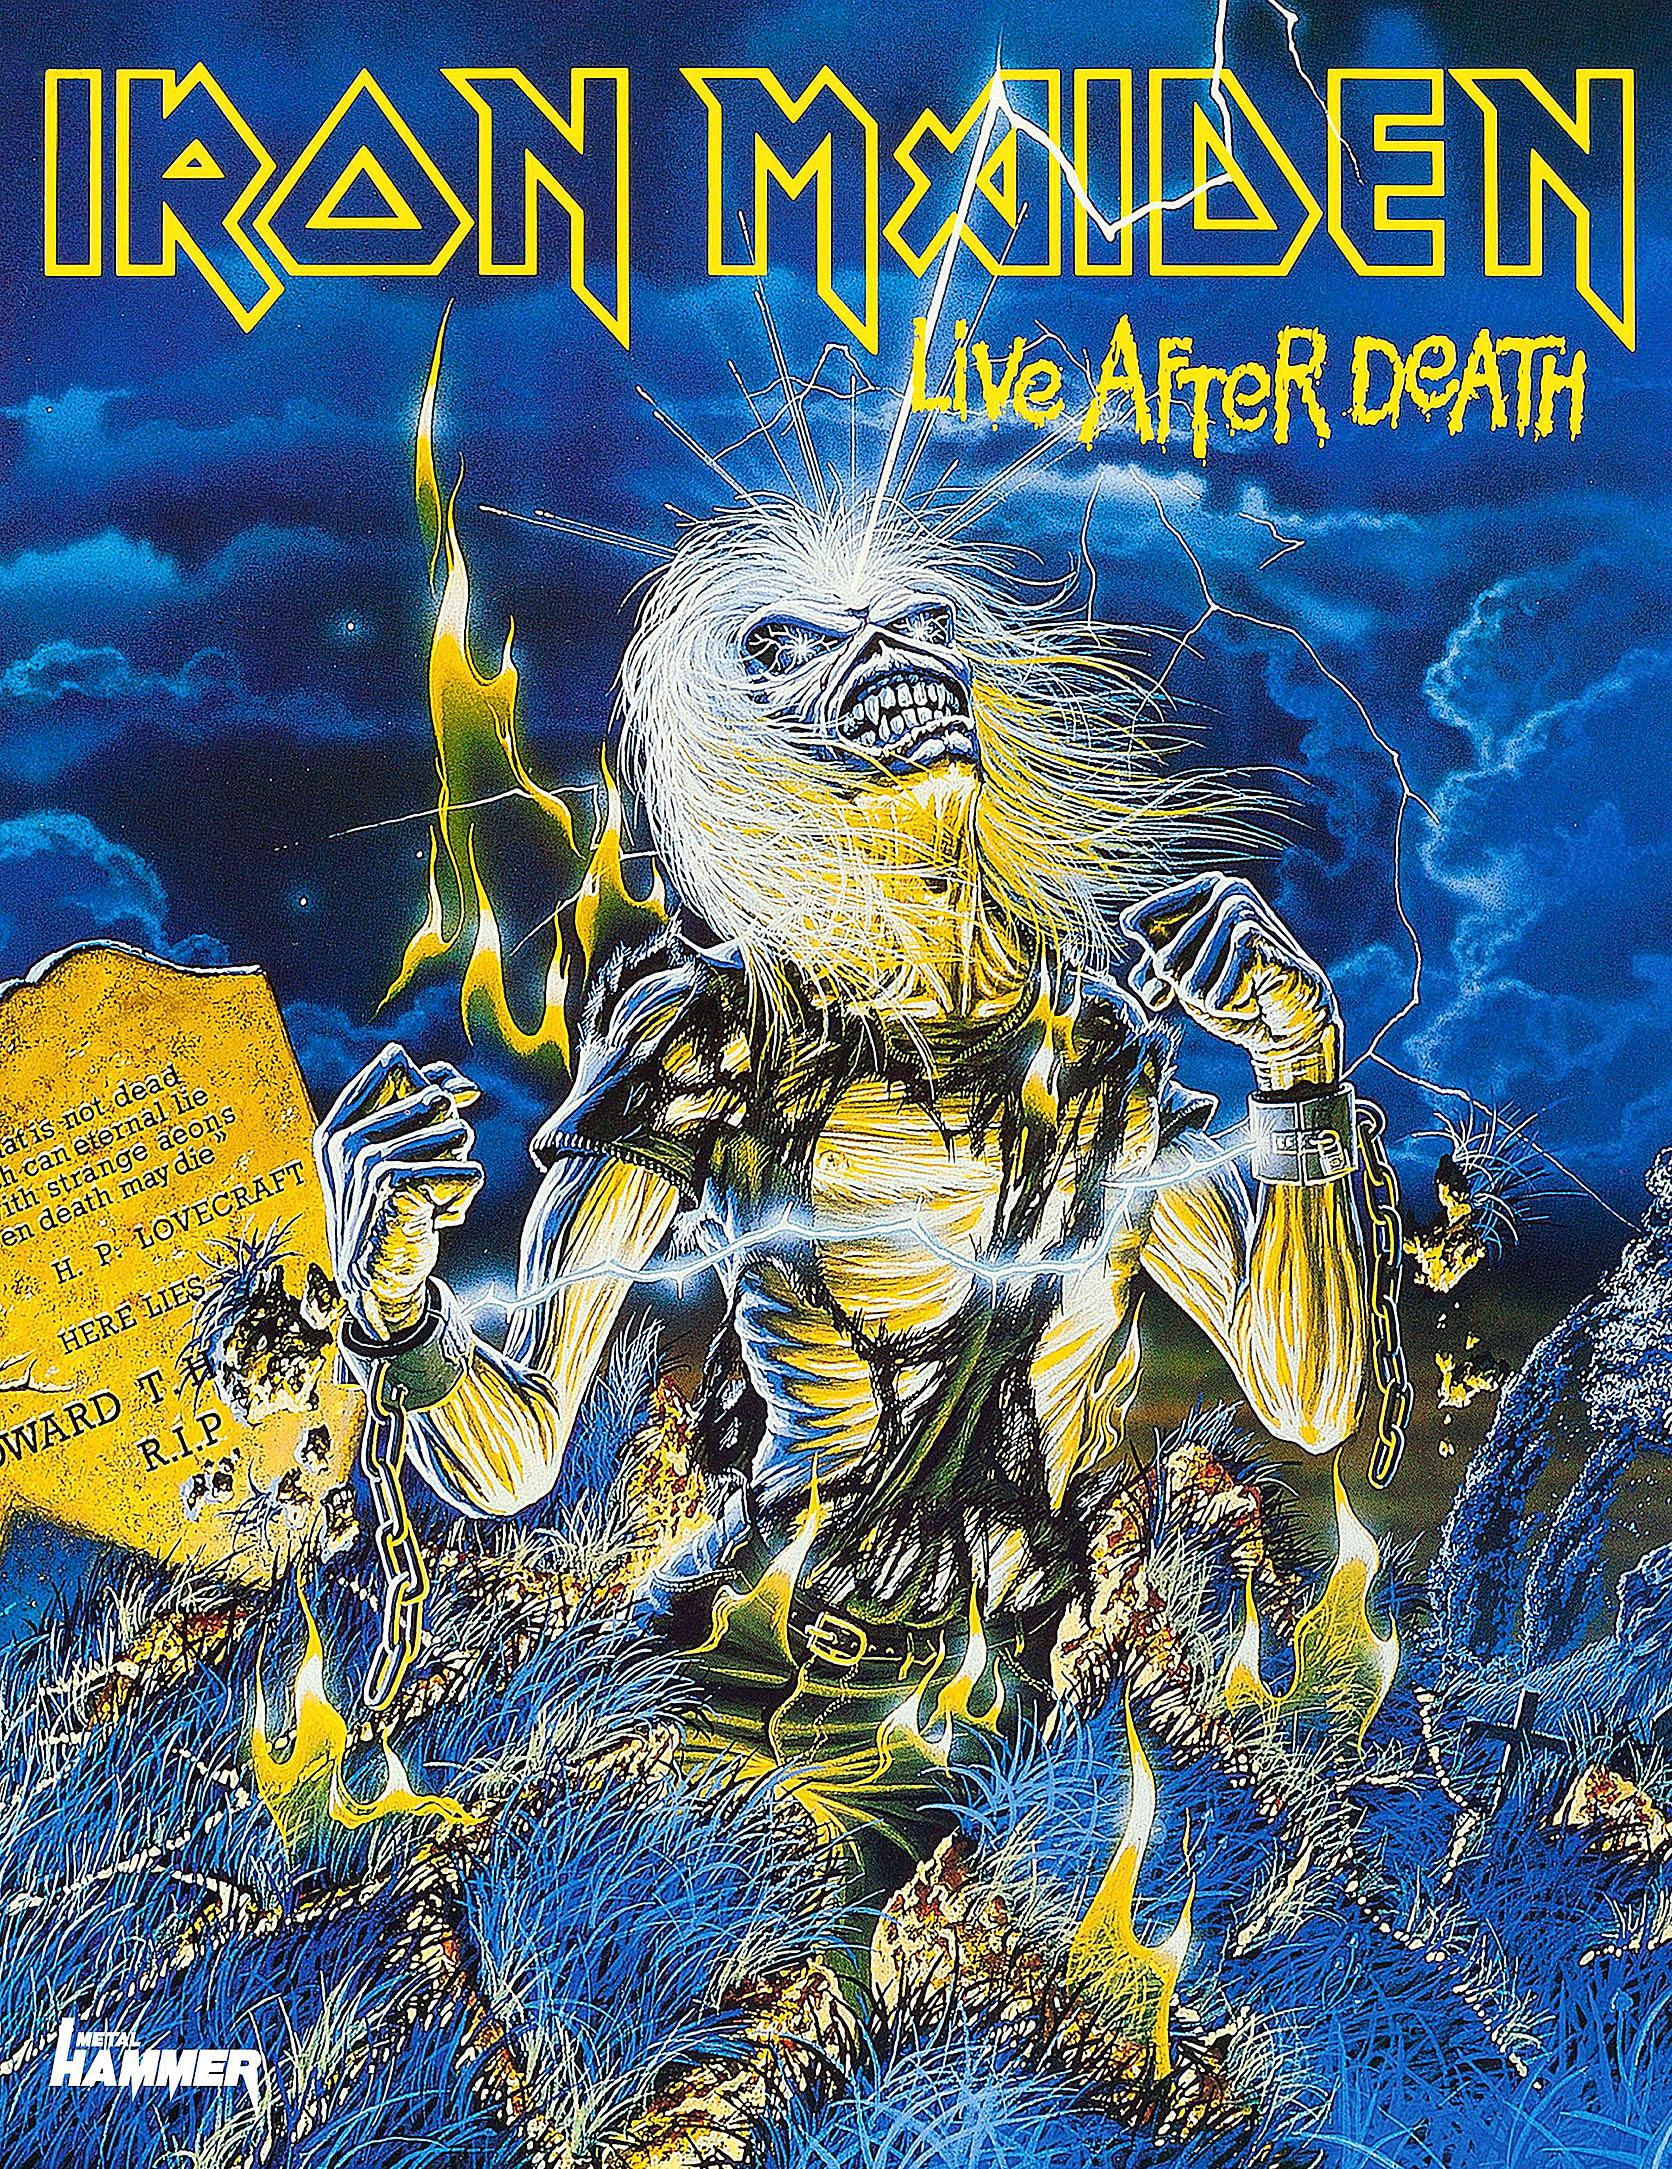 Metal Hammer Ger 2020-06 IM.jpg